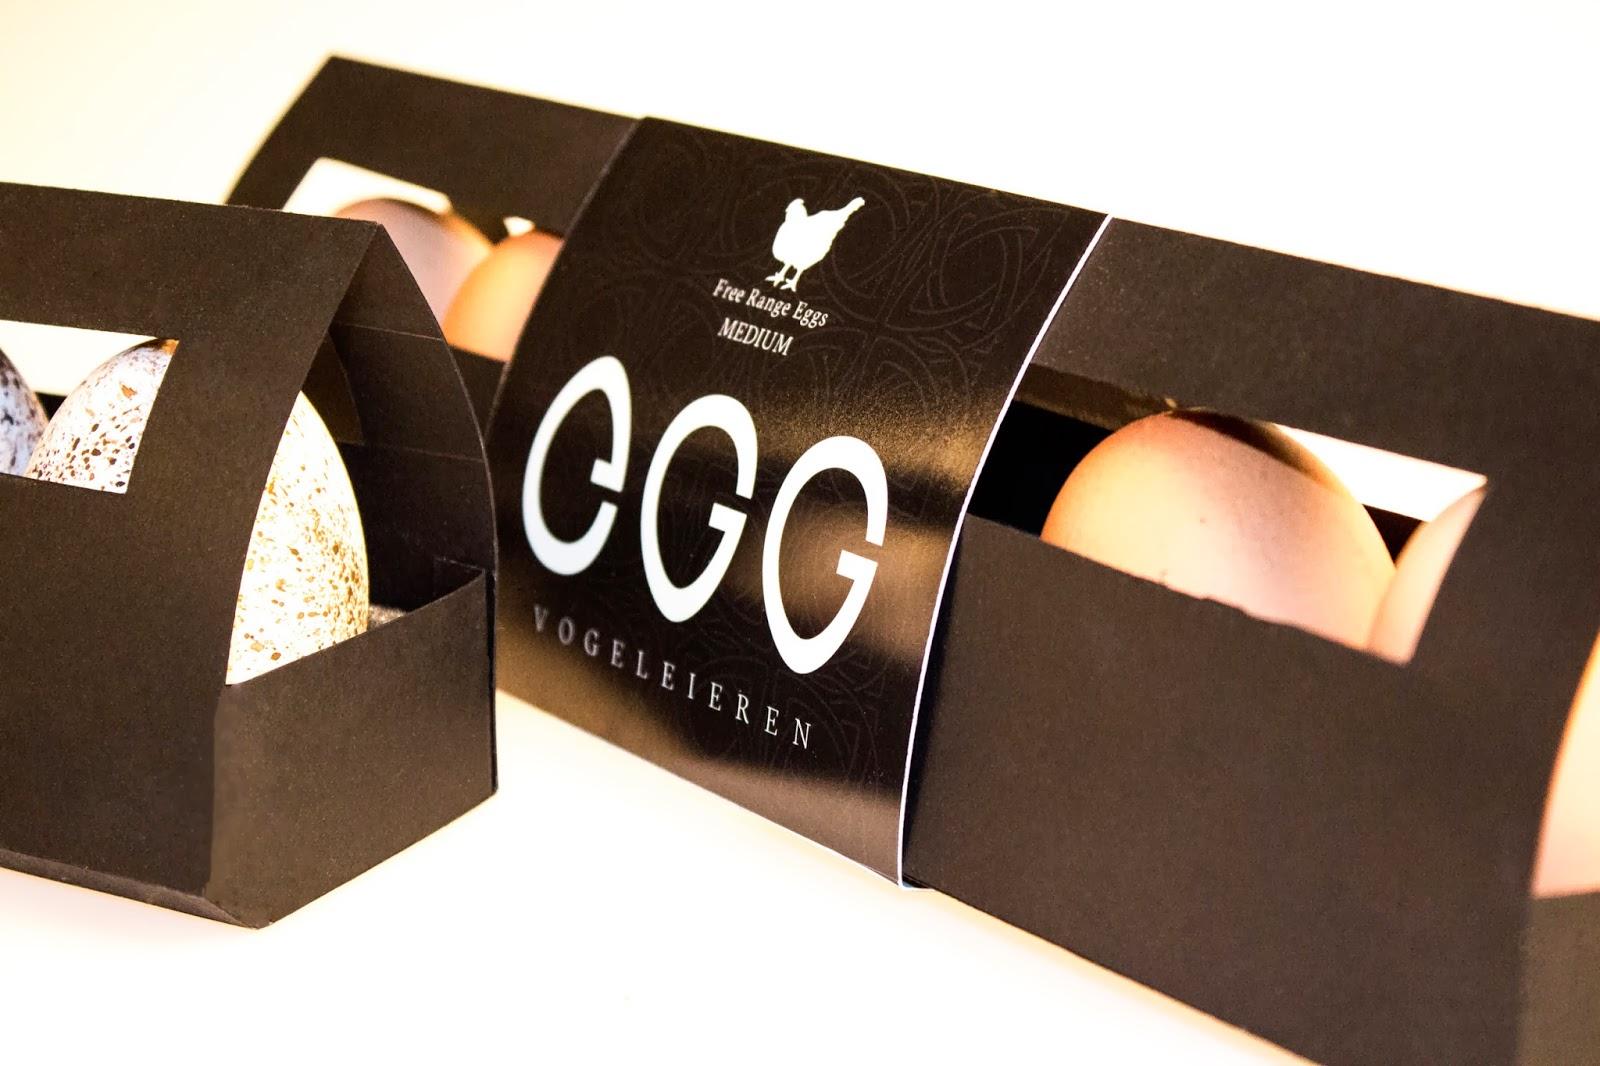 Vogeleieren Premium Eggs Student Project On Packaging Of